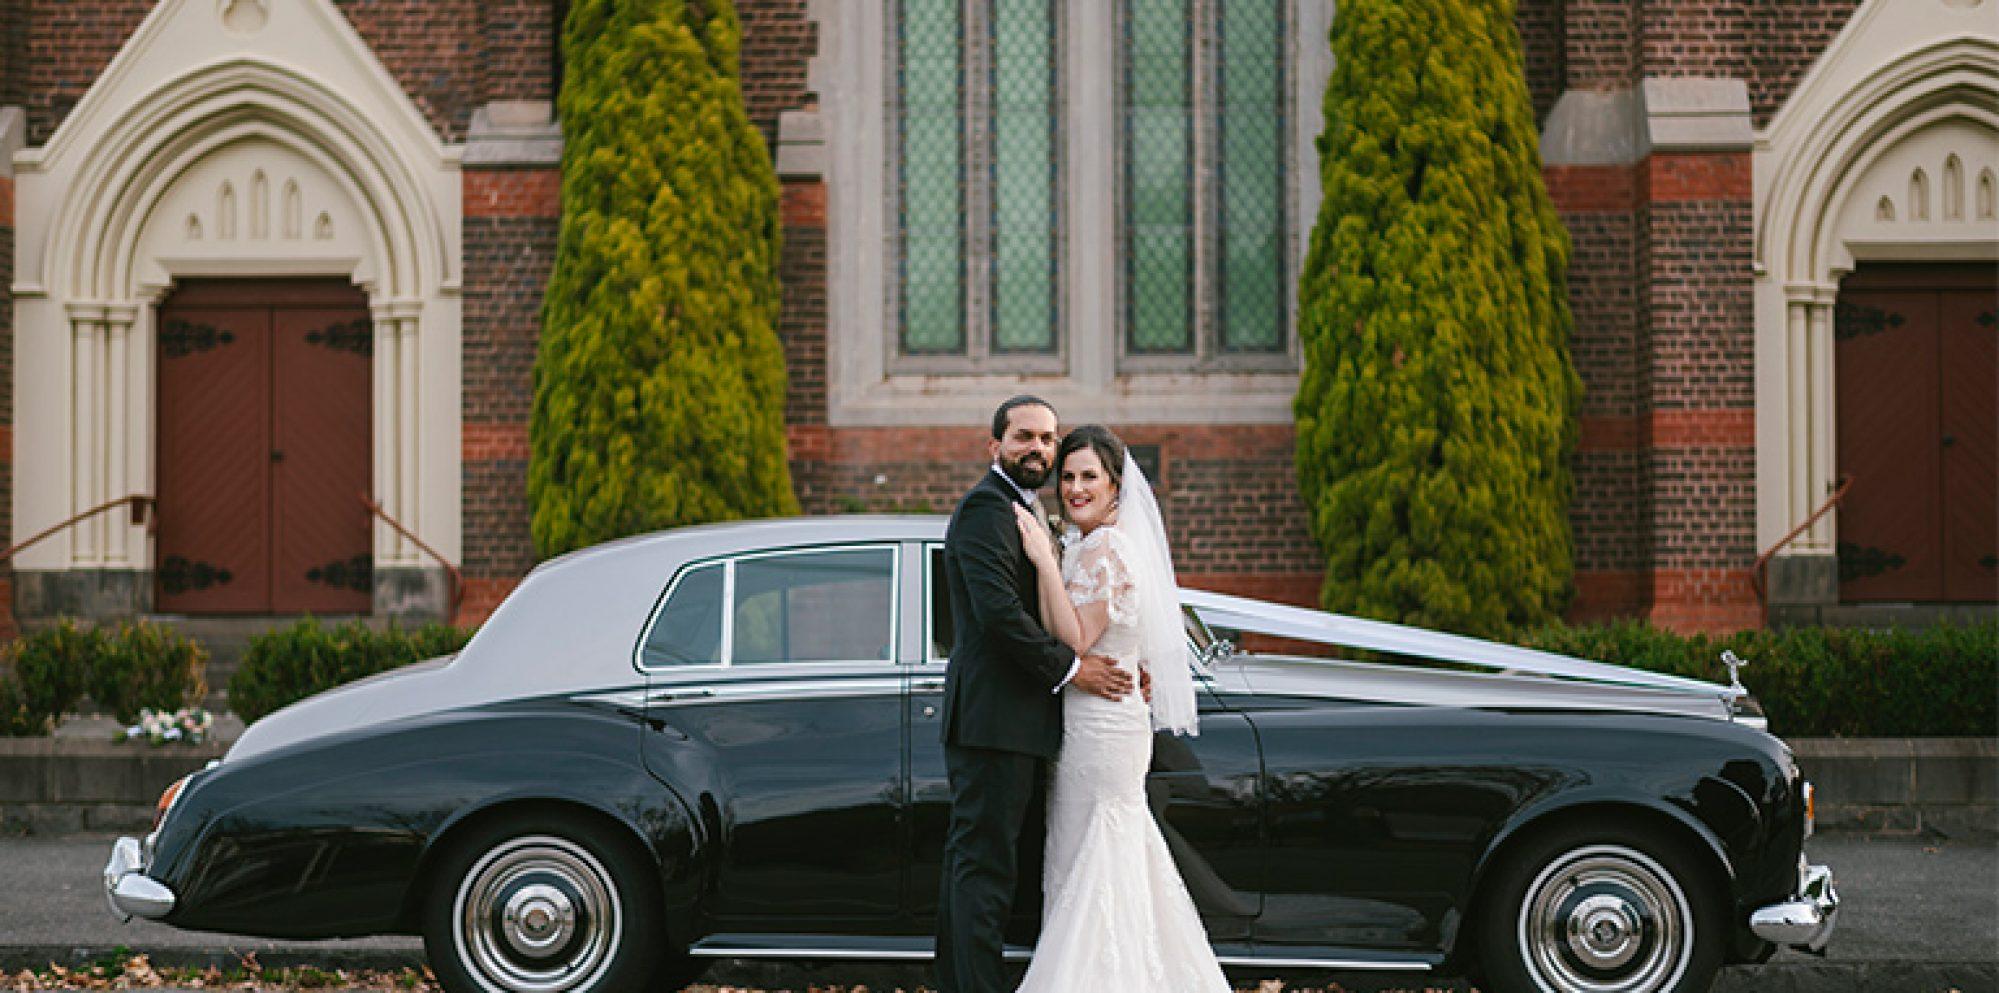 Claire and zach wedding photography @rickett's point beaumaris